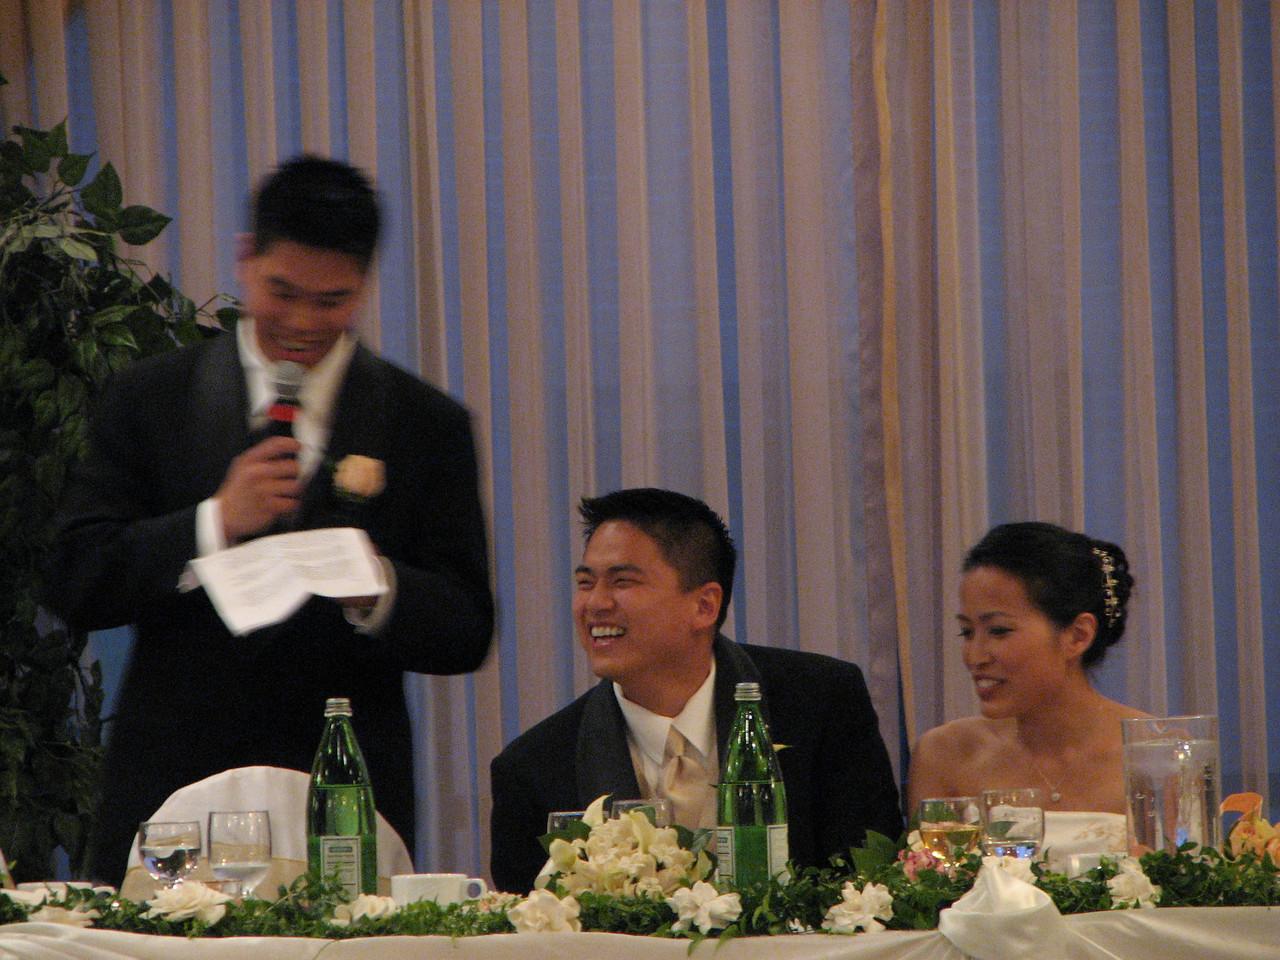 2007 06 09 Sat - Best man toast 1 - Johnny Chen, Danny & Jessica Chen